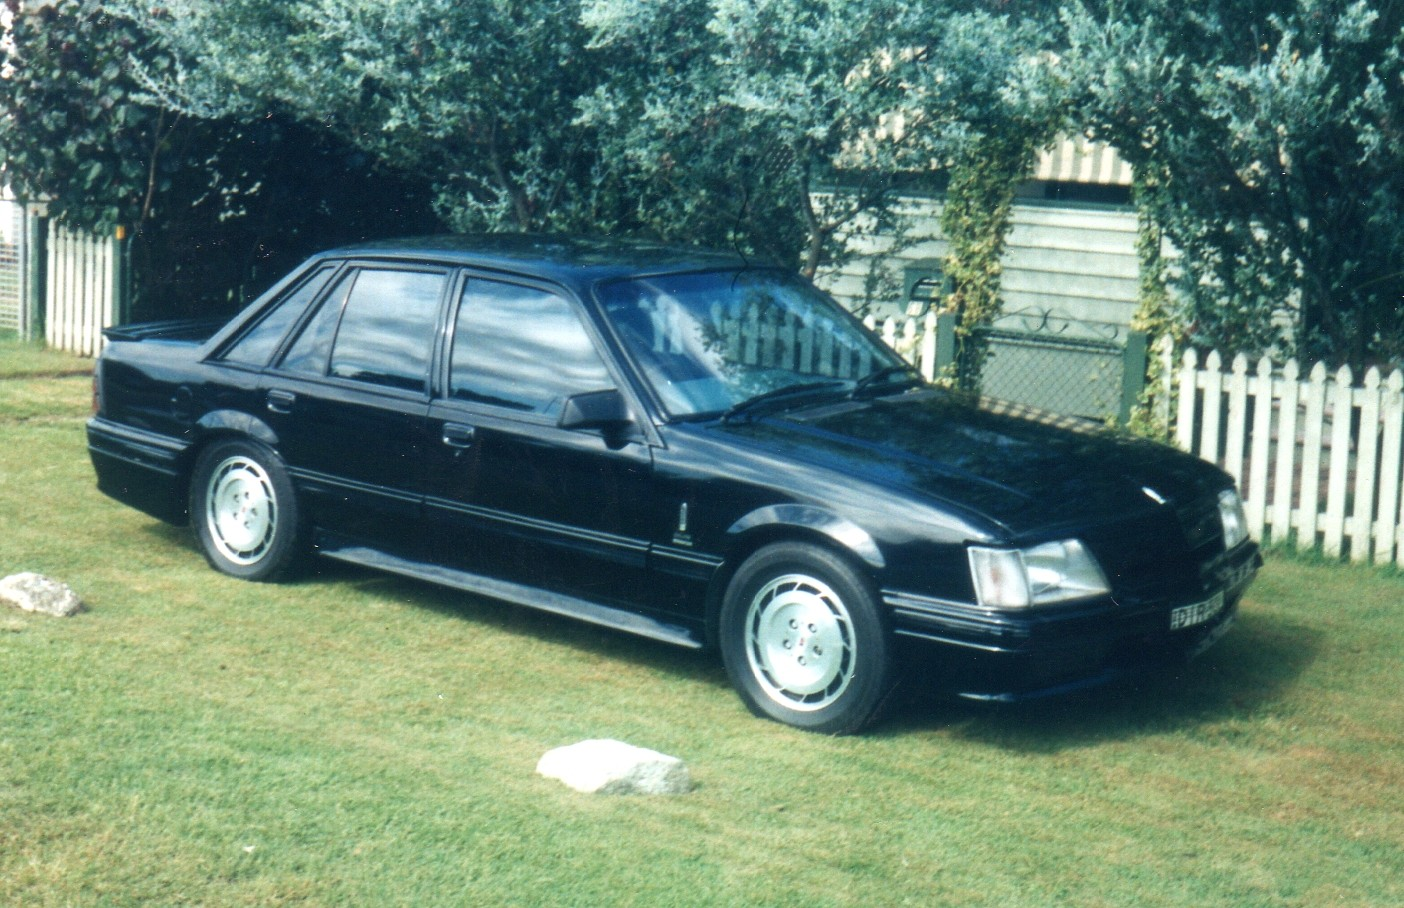 1985 Holden Dealer Team commodore director